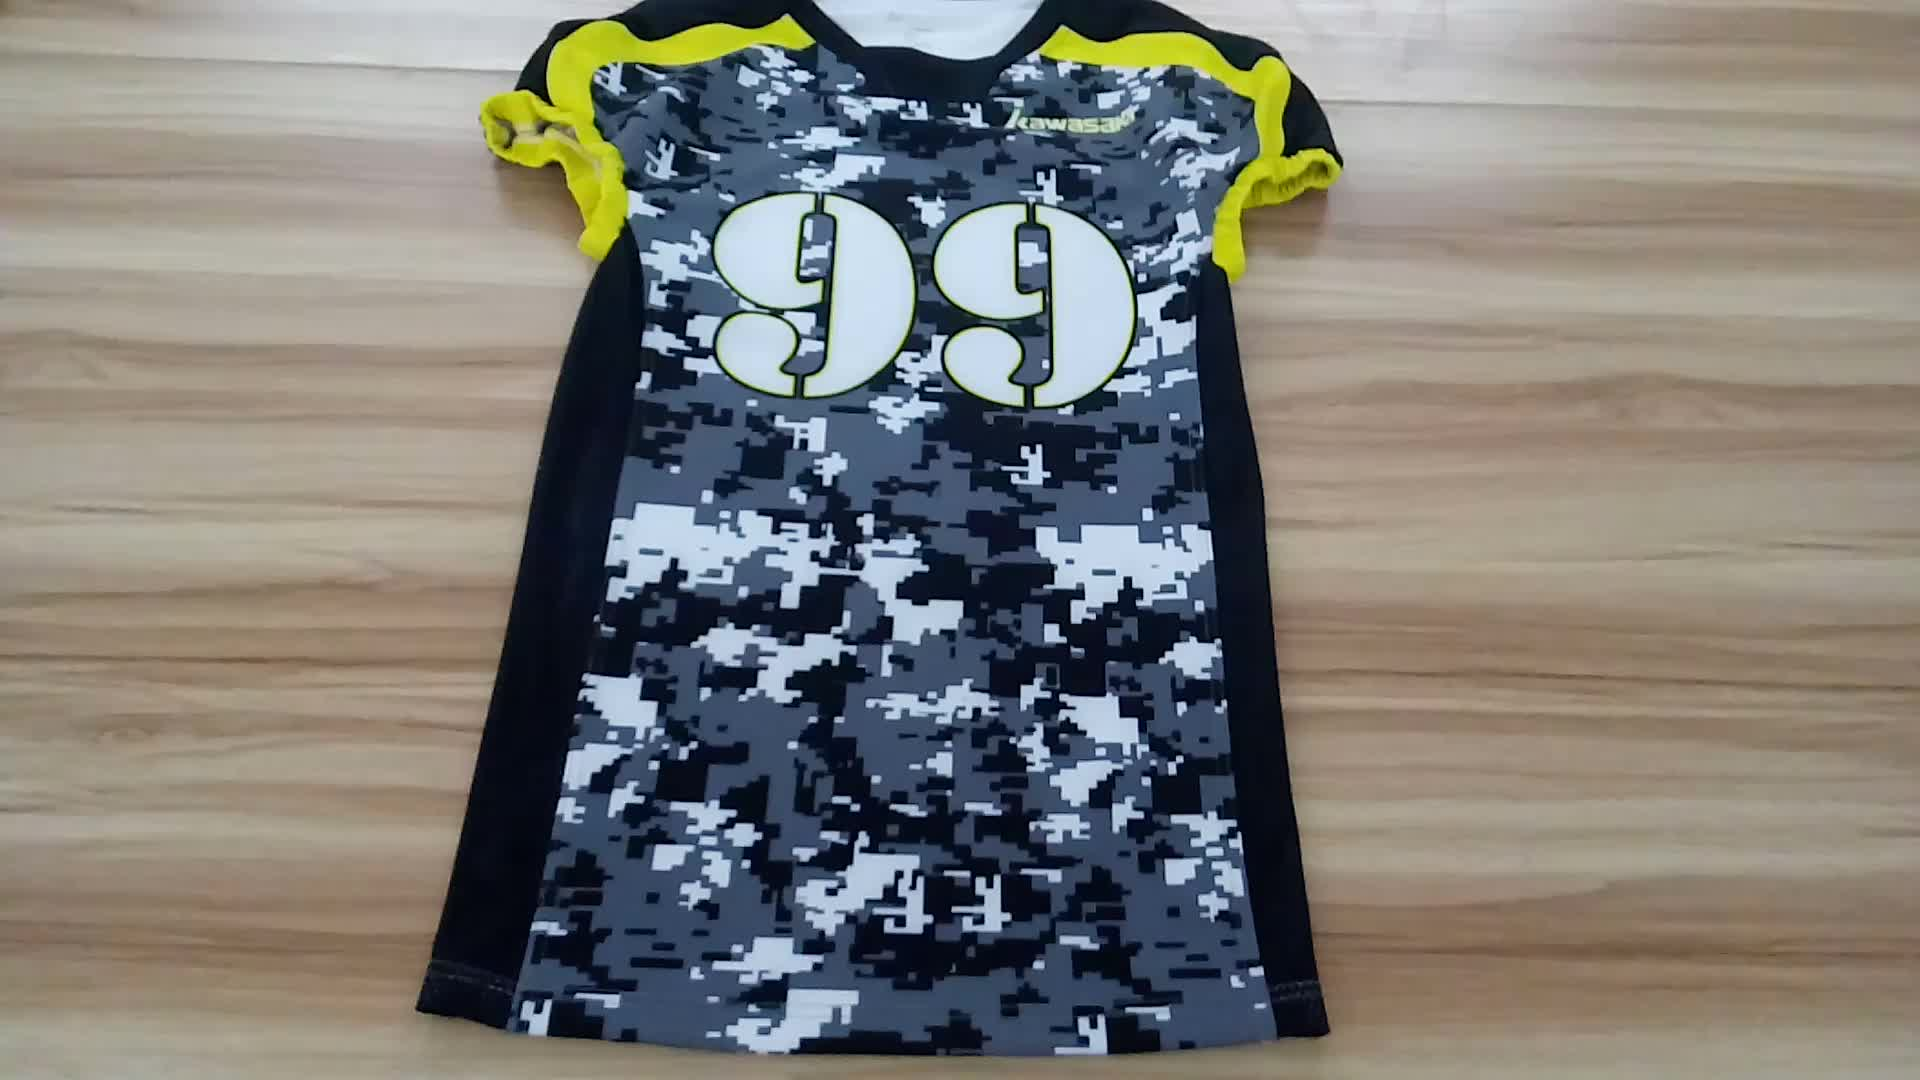 23a49a7e2 2017 Stitched Customized American Football Uniform